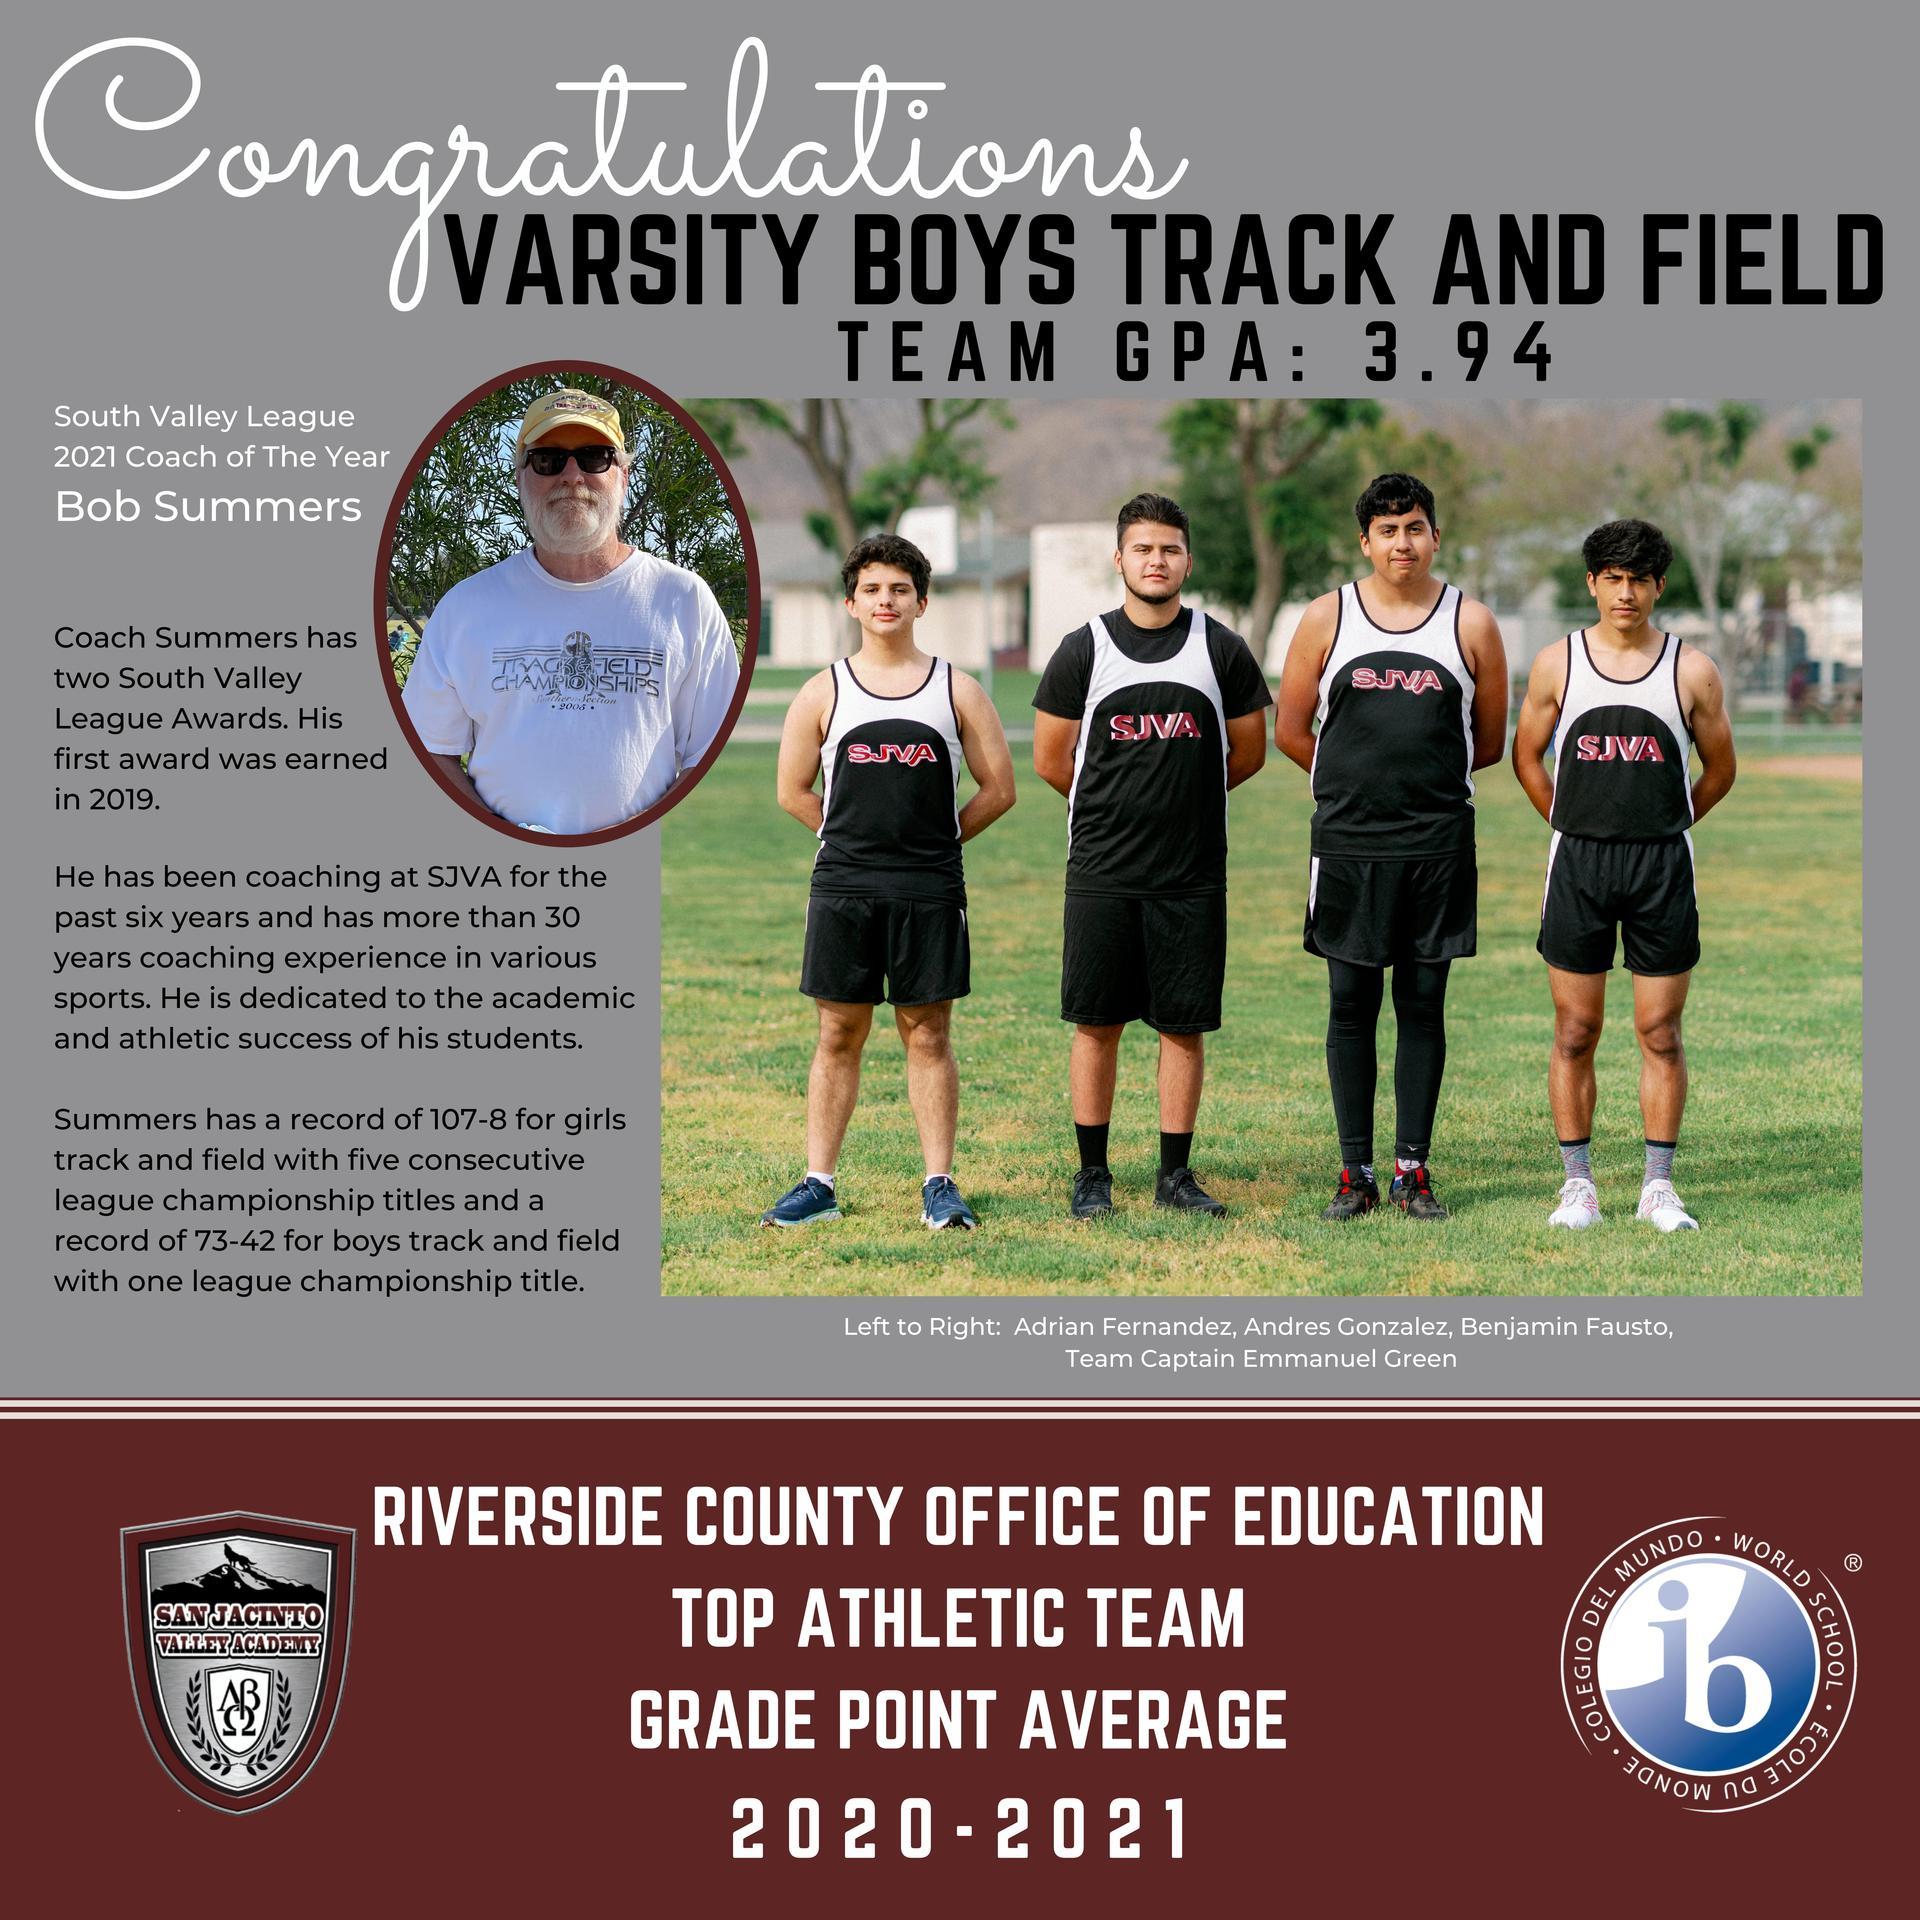 Top G.P.A. team in Riverside